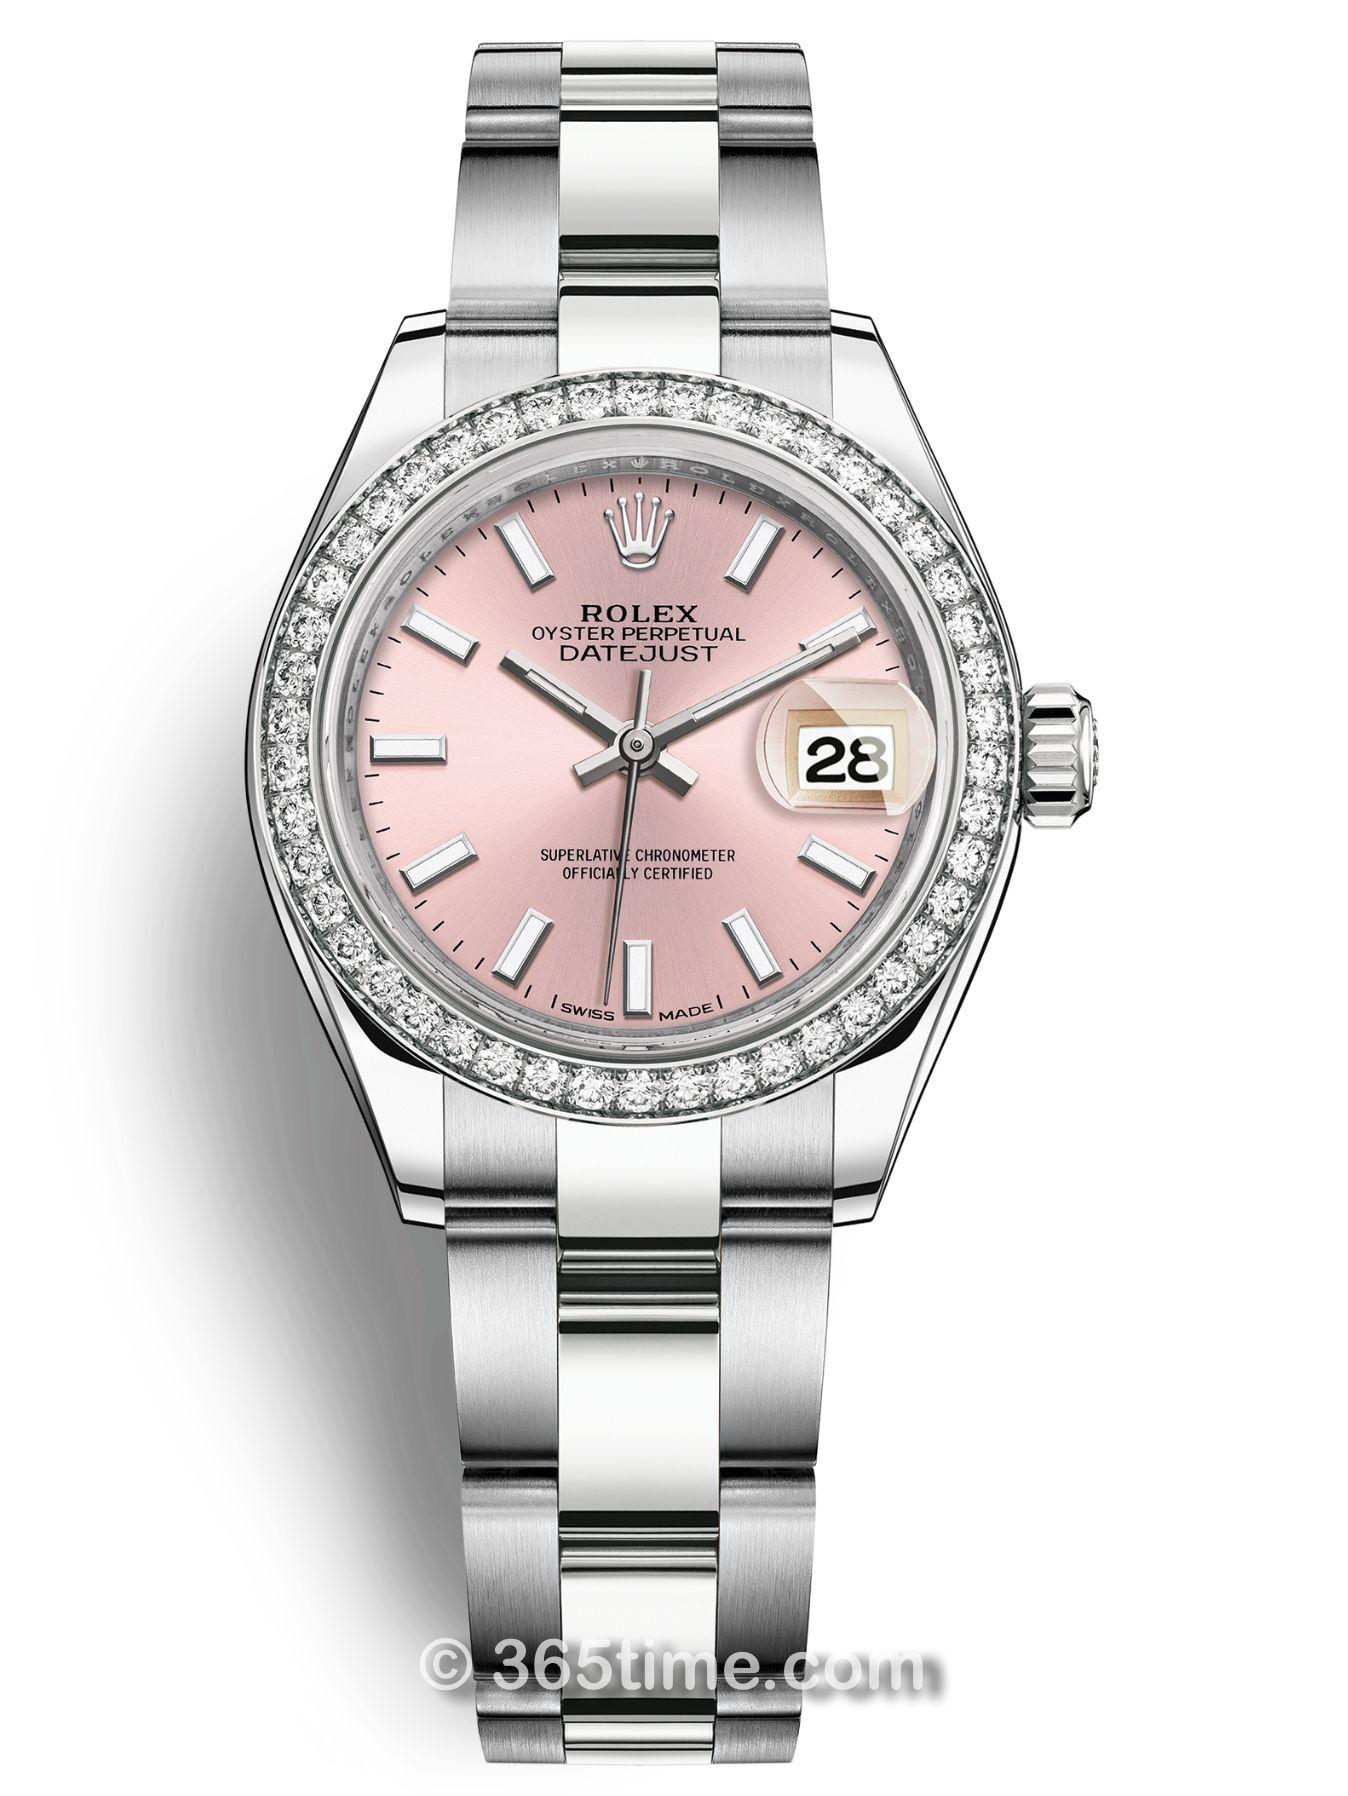 Rolex劳力士女装日志型28白金镶钻手表279384rbr-0002